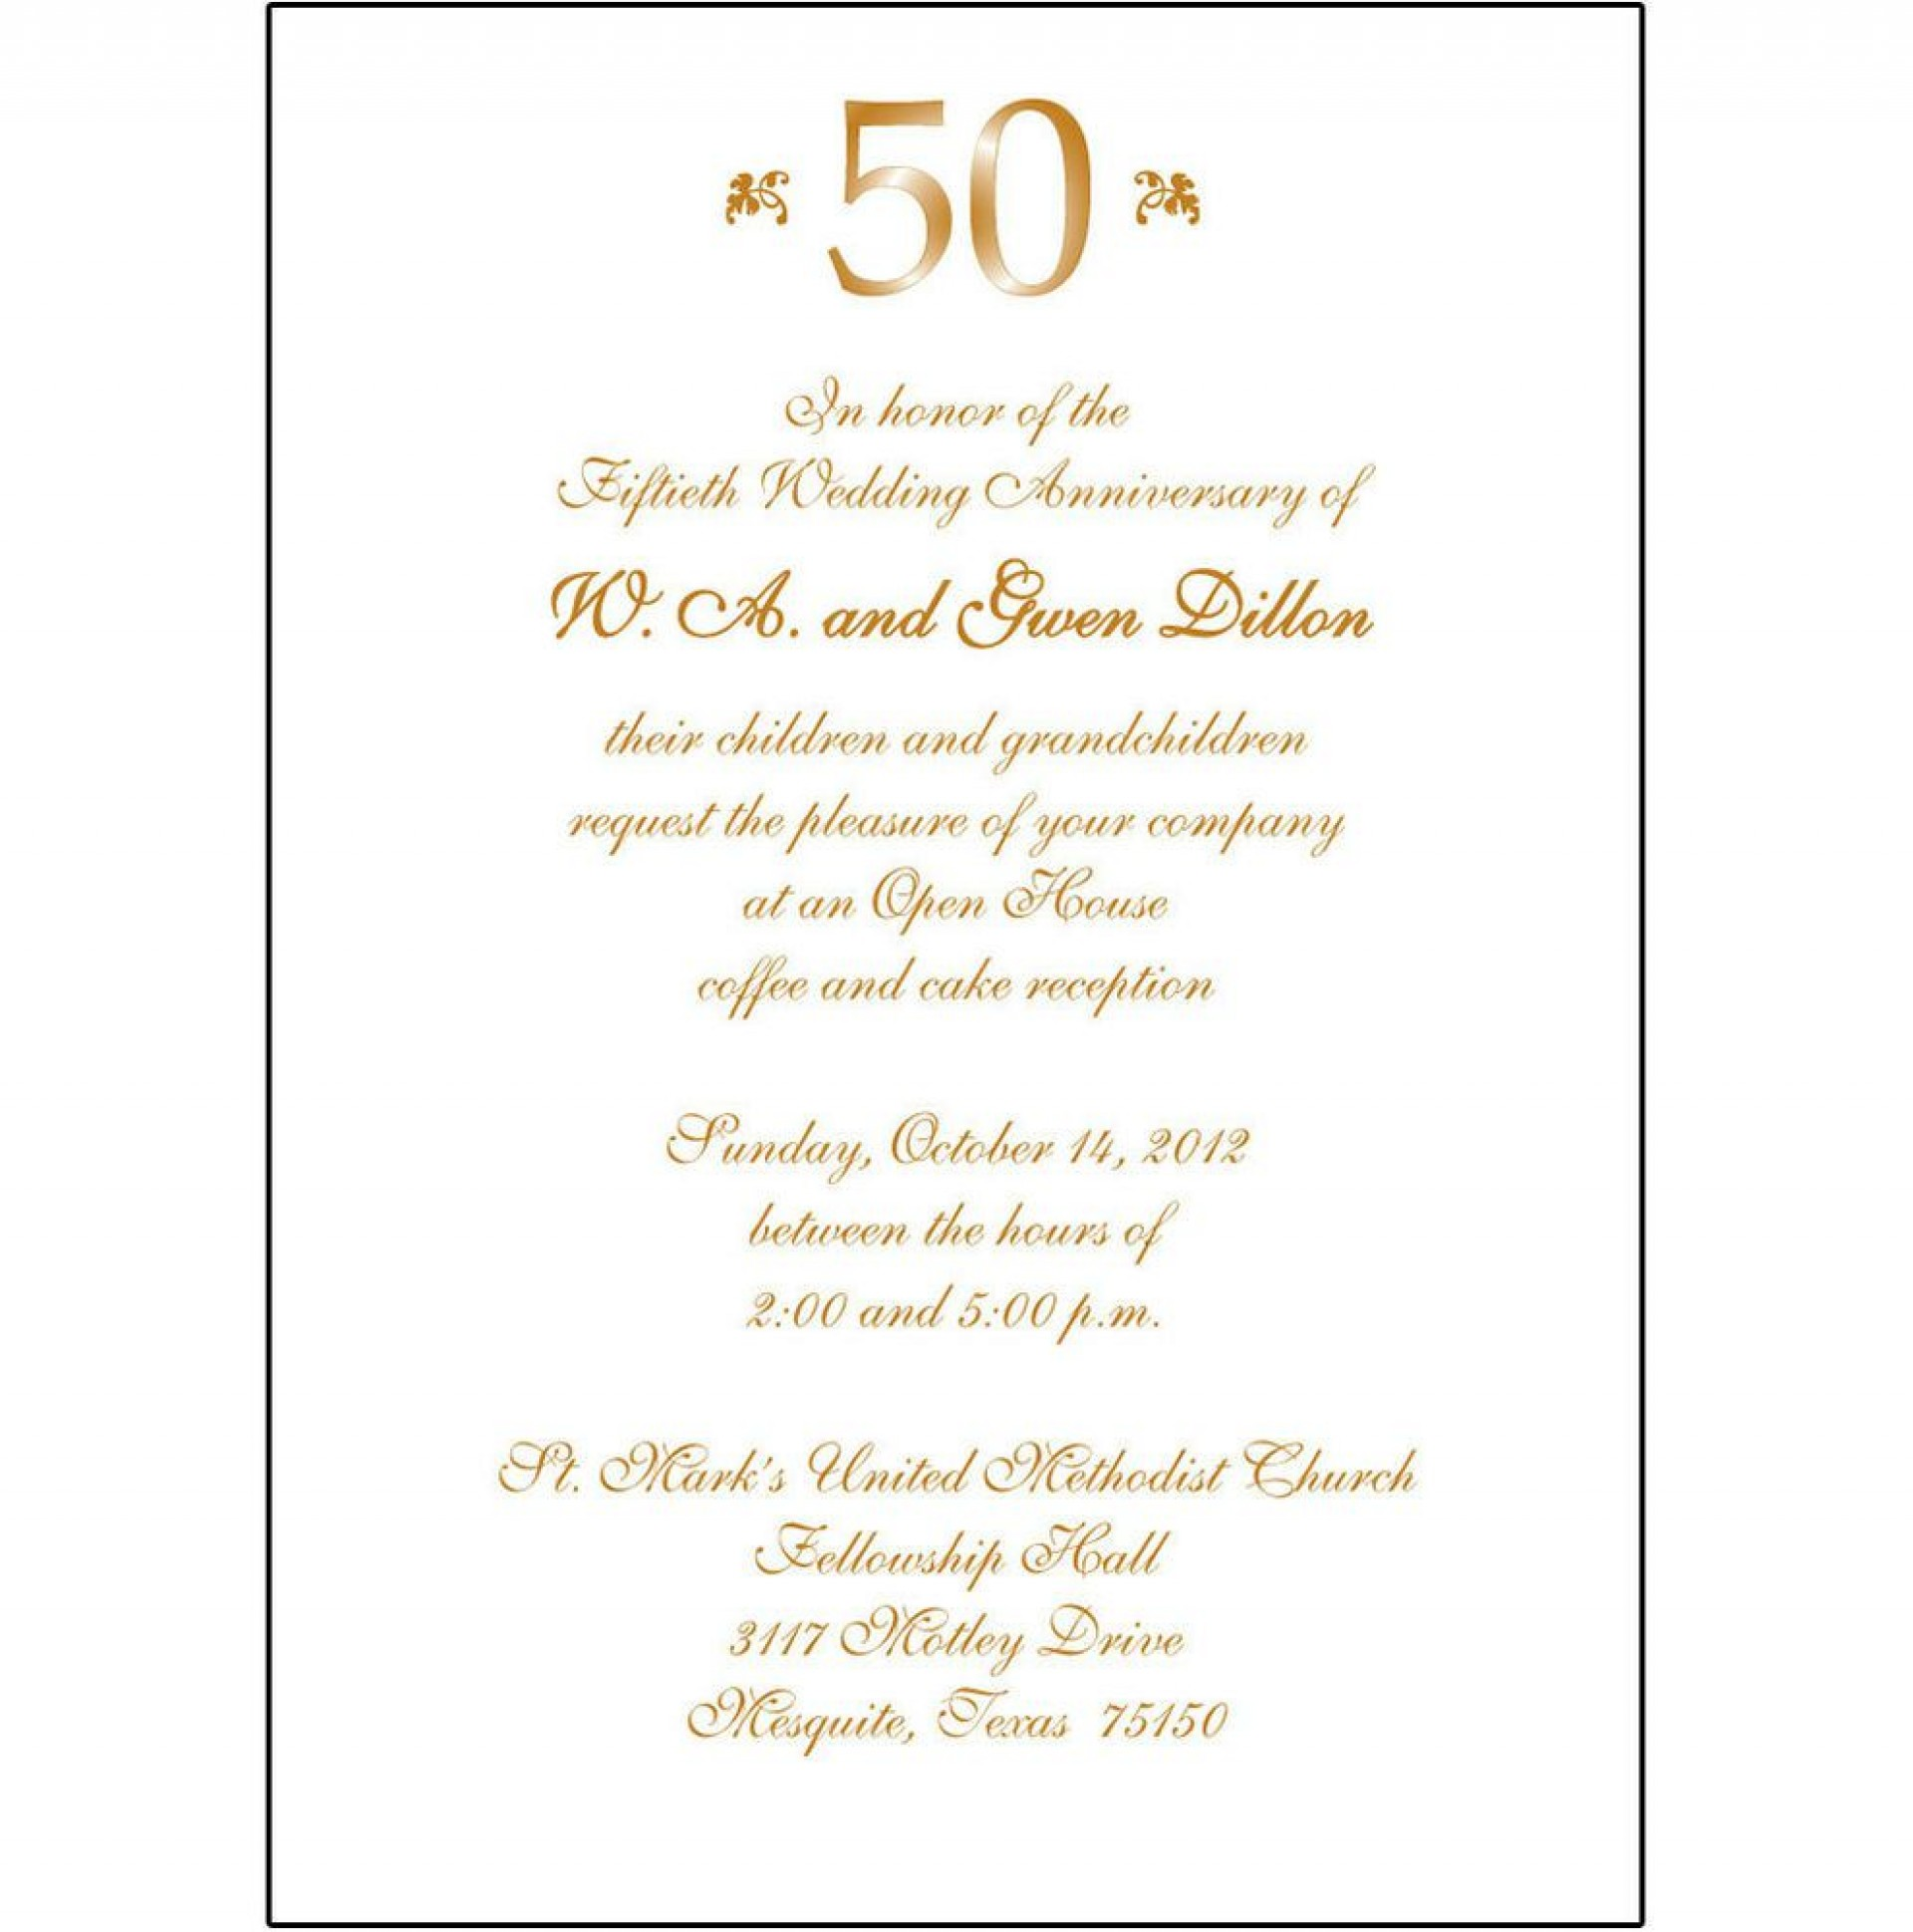 008 Fantastic 50th Anniversary Invitation Wording Sample Inspiration  Samples Wedding Card1920